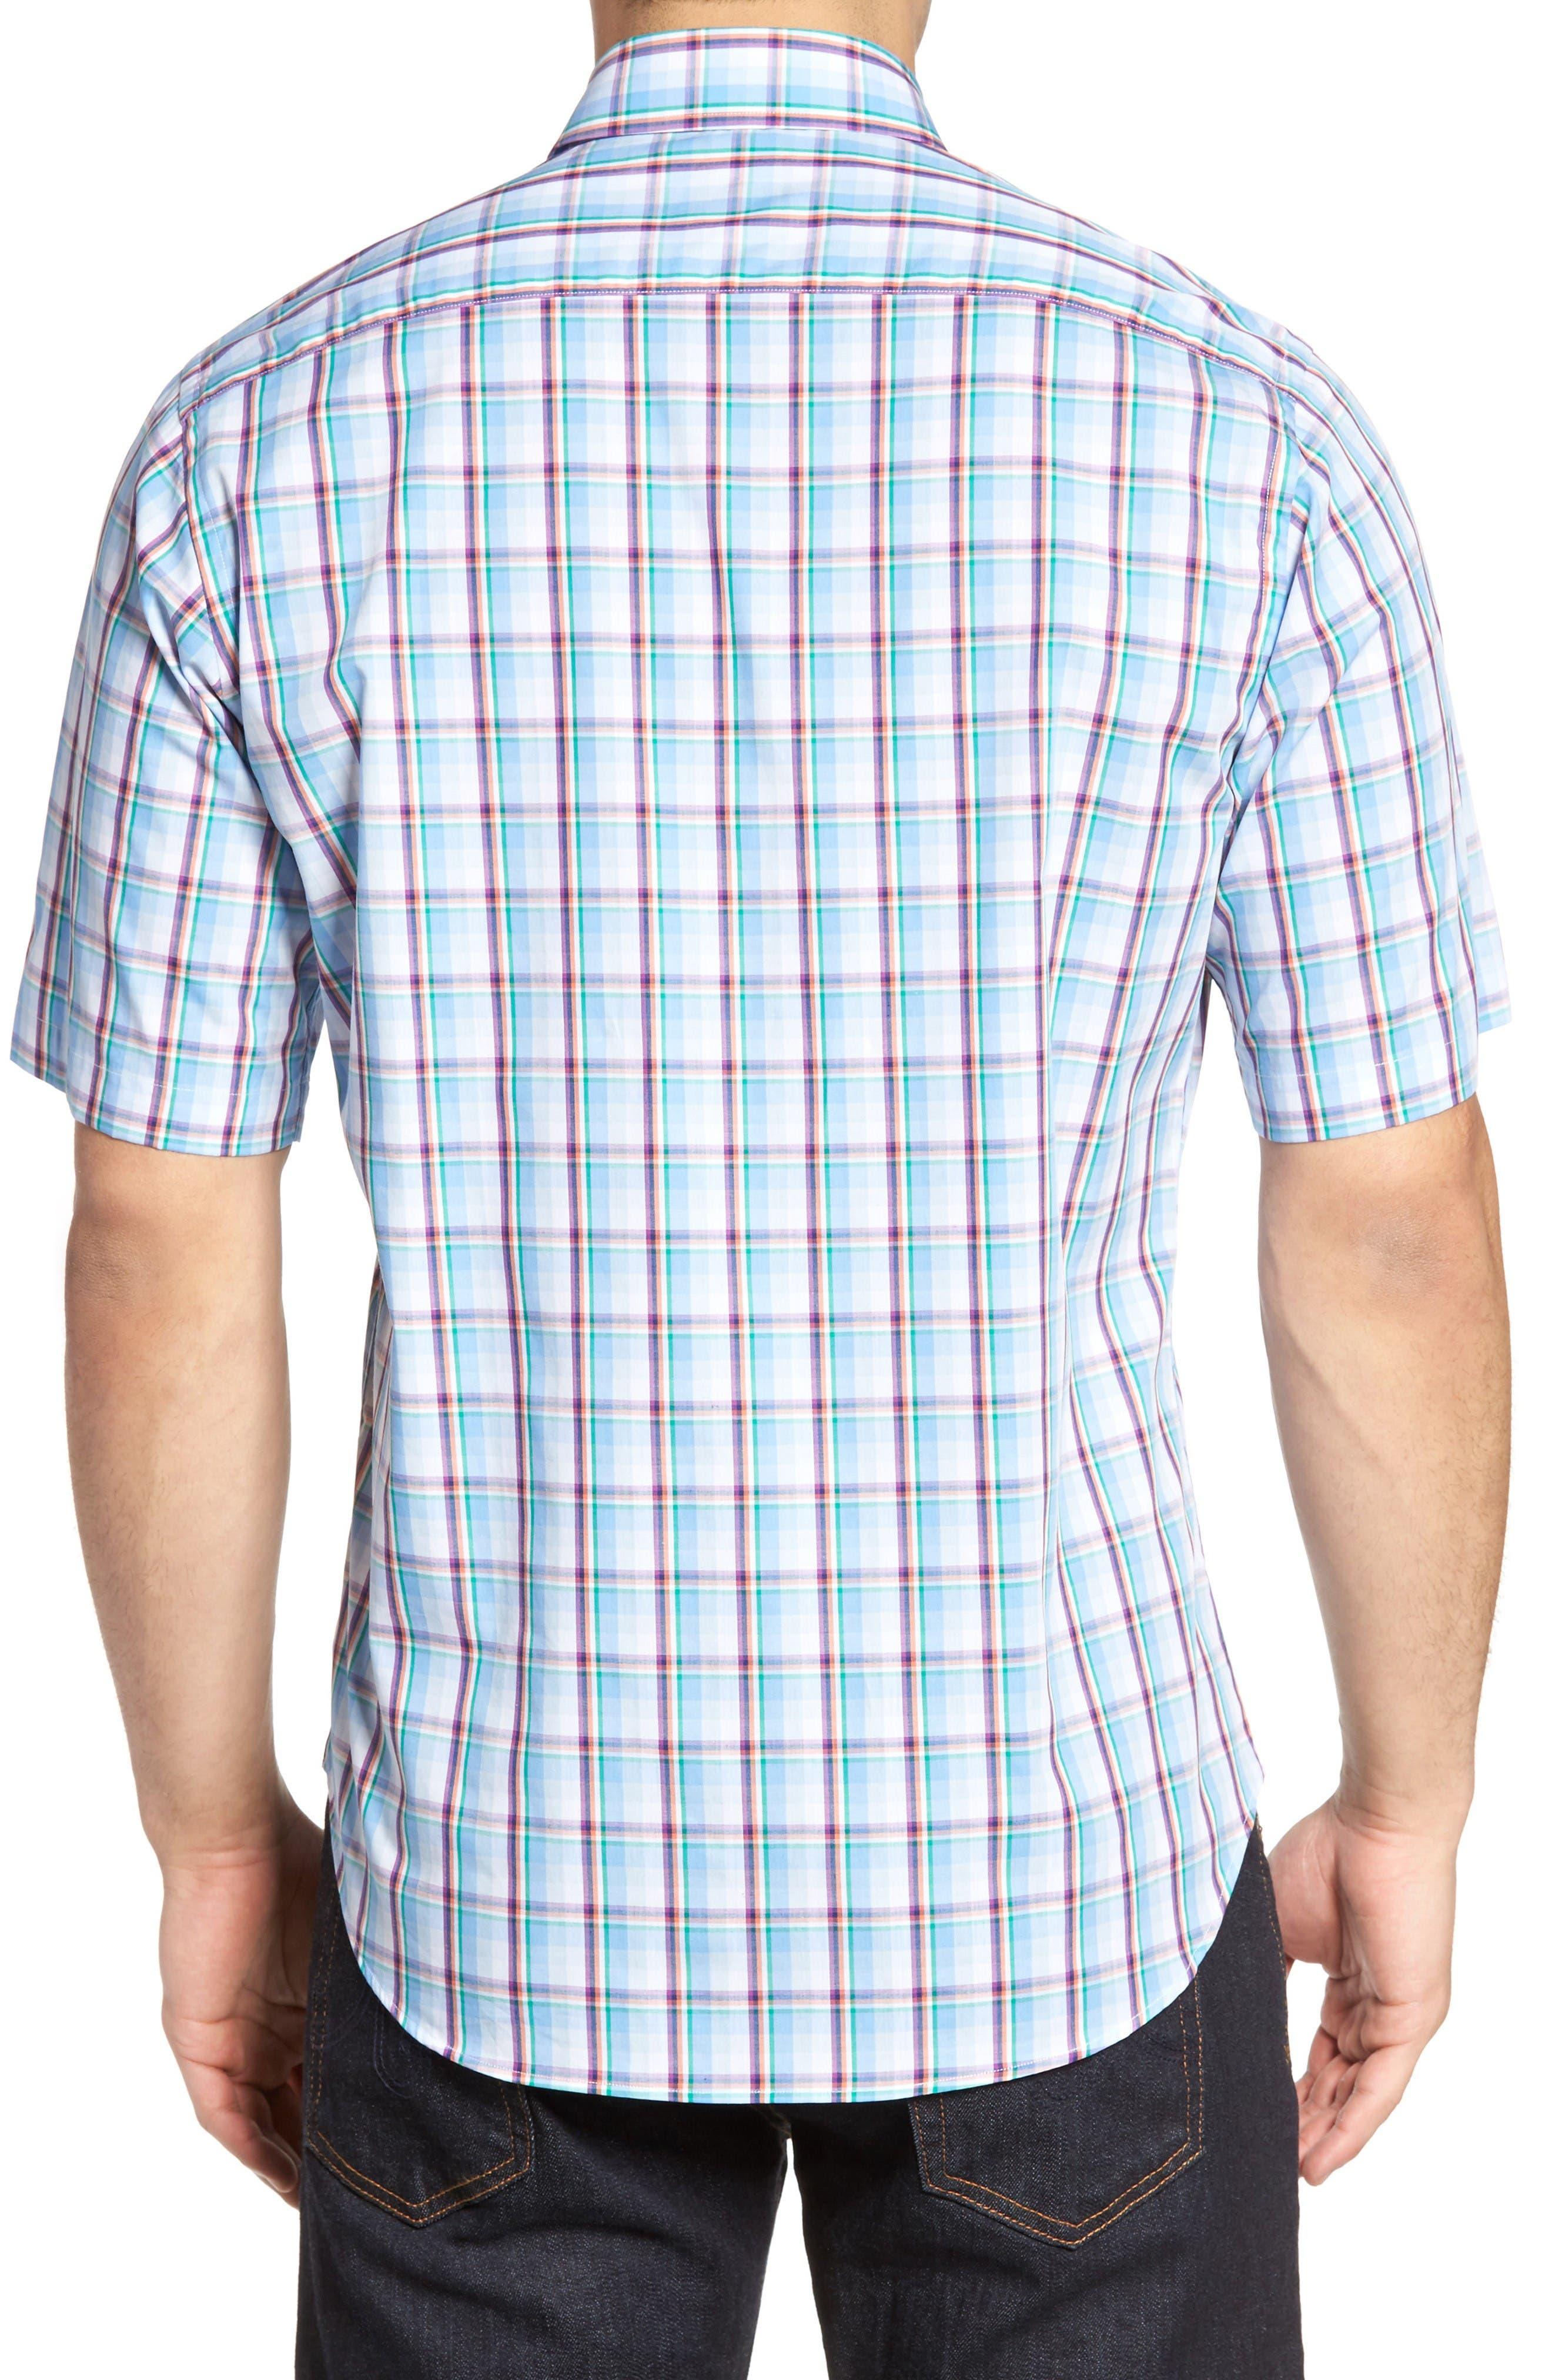 Alternate Image 2  - TailorByrd Pinyon Plaid Sport Shirt